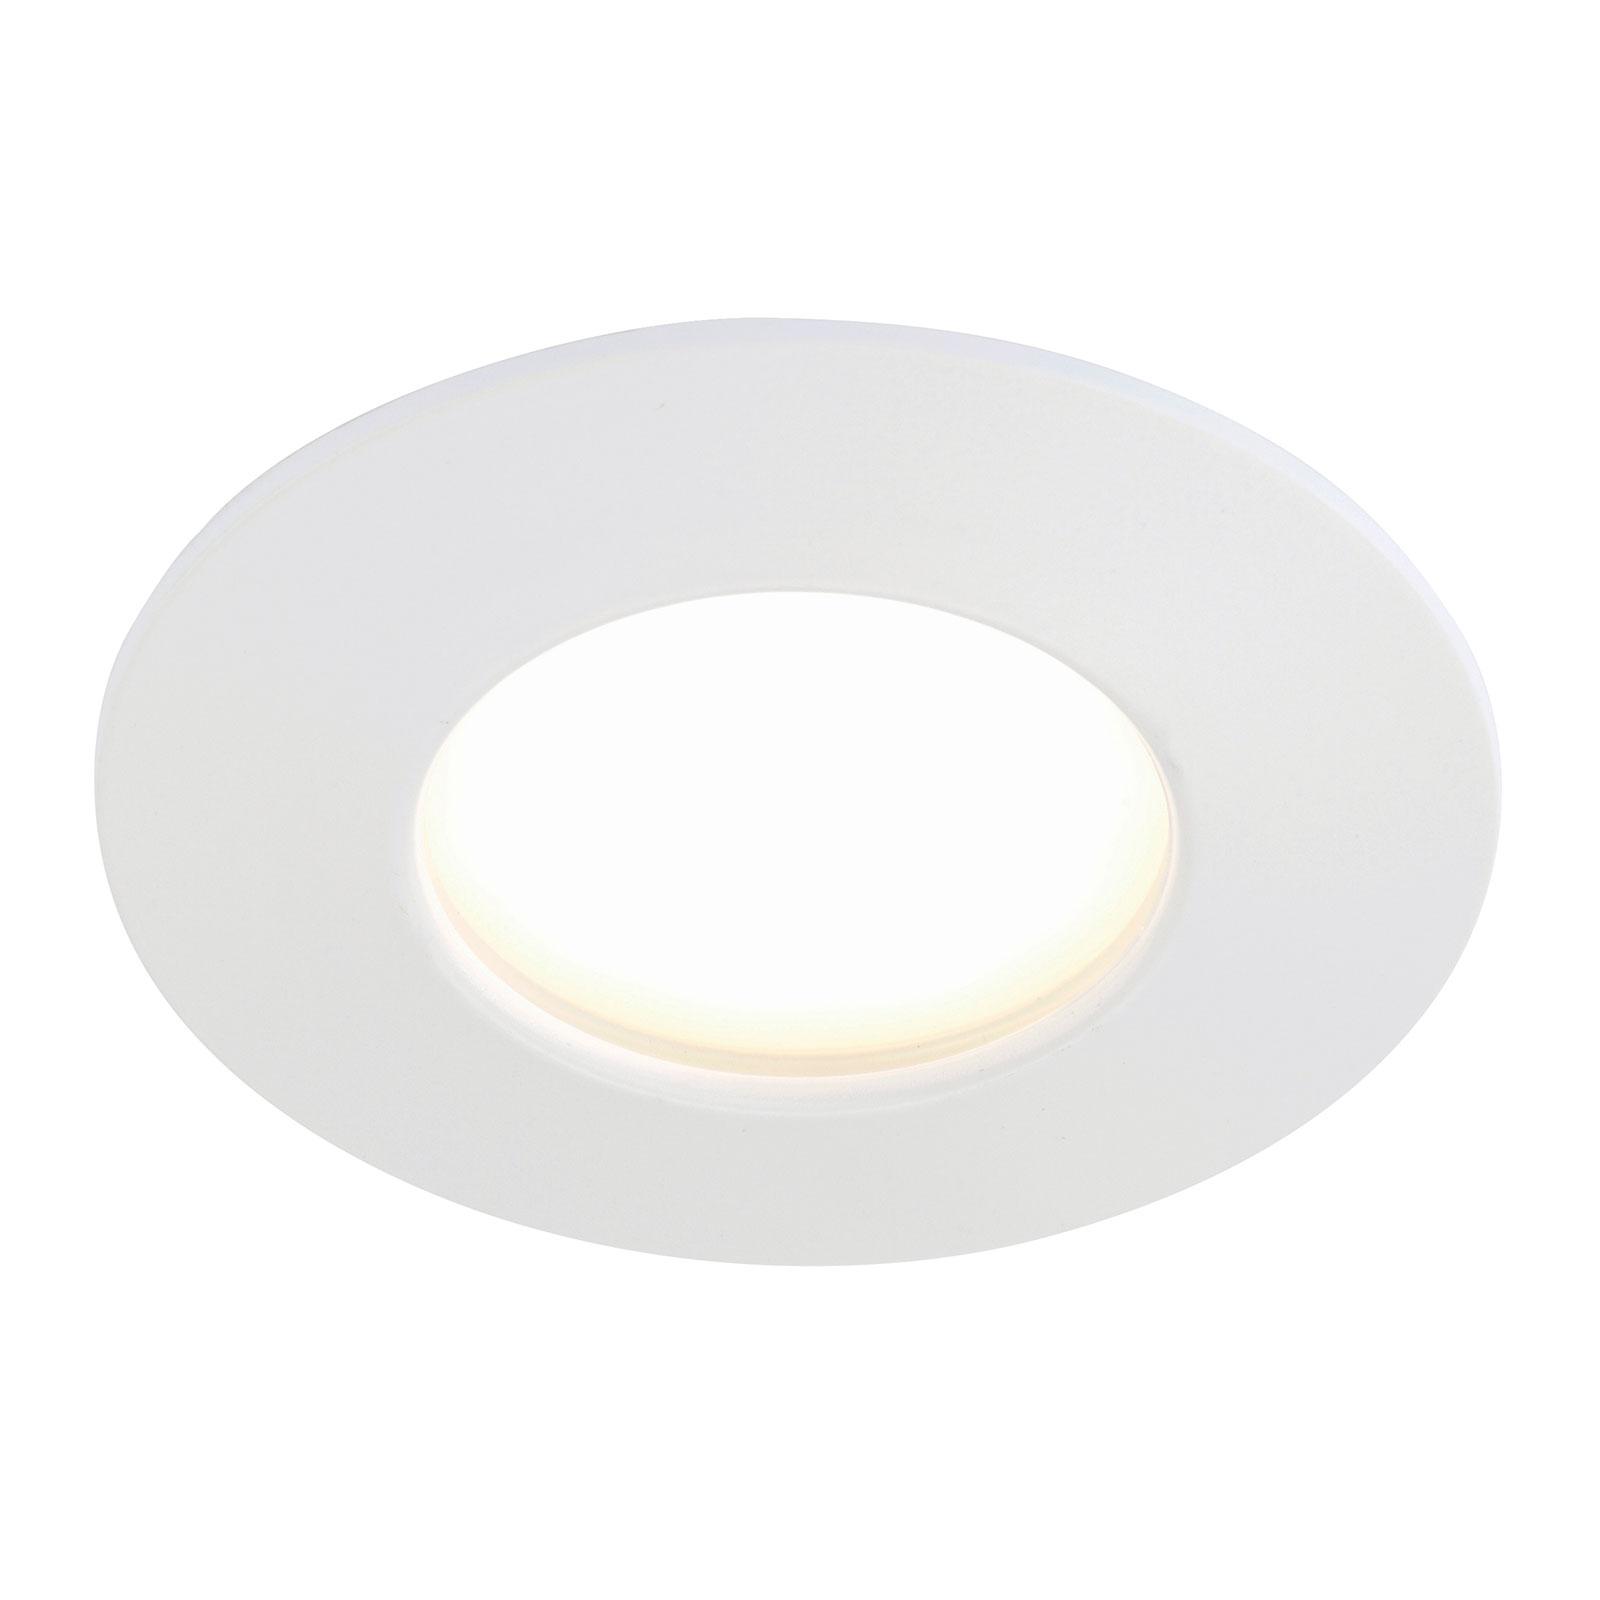 White LED recessed light Felia, IP44_1510319_1